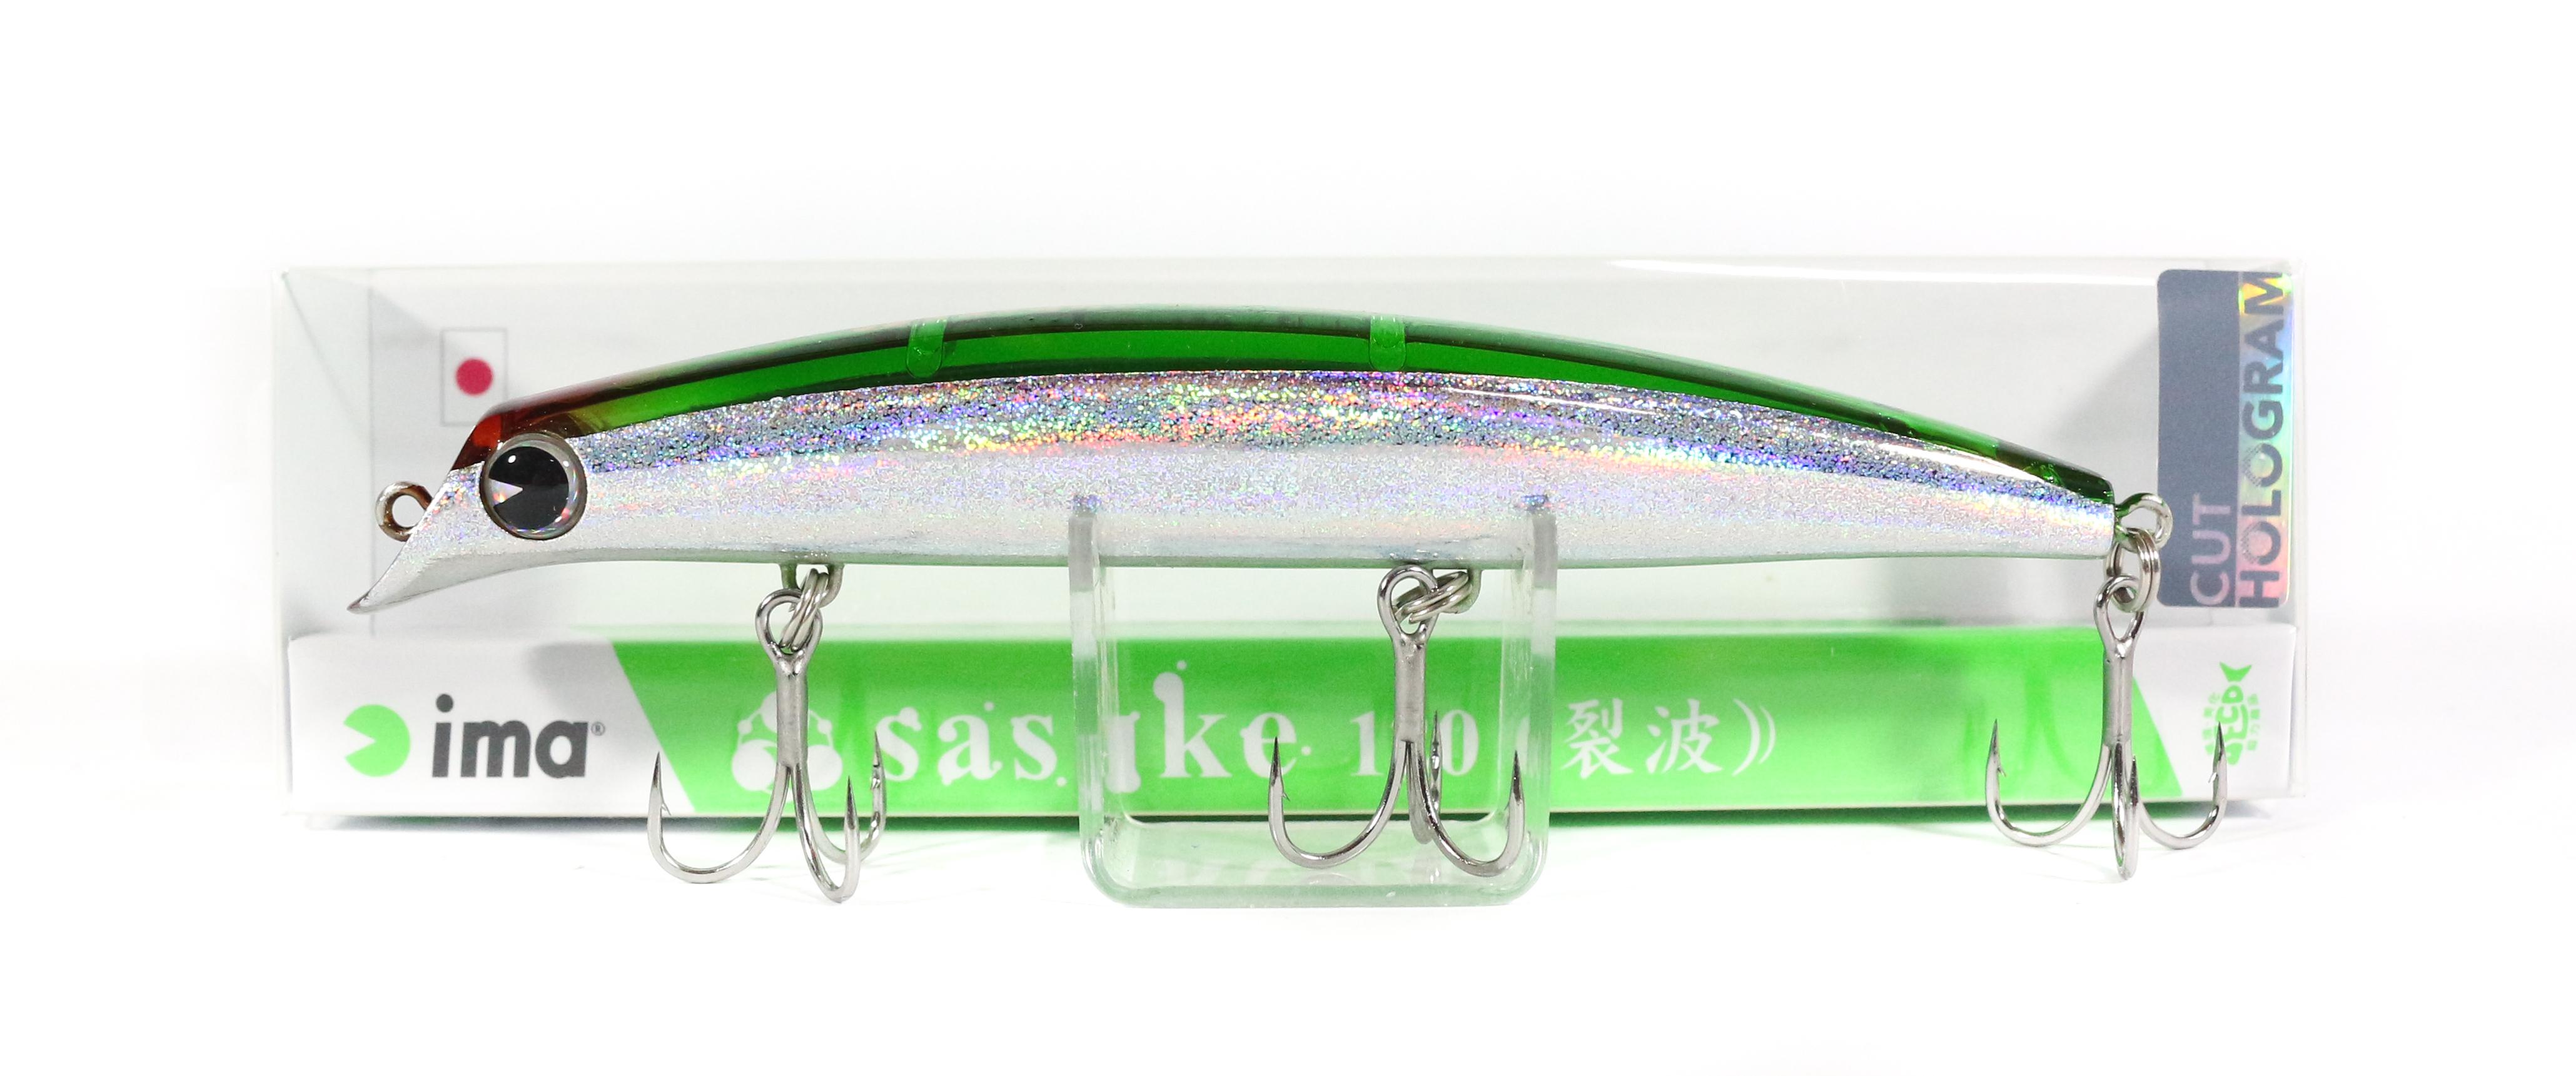 Ams design ima Minnow Sasuke tear wave 120 mm 17 g bora # RP 217 lure